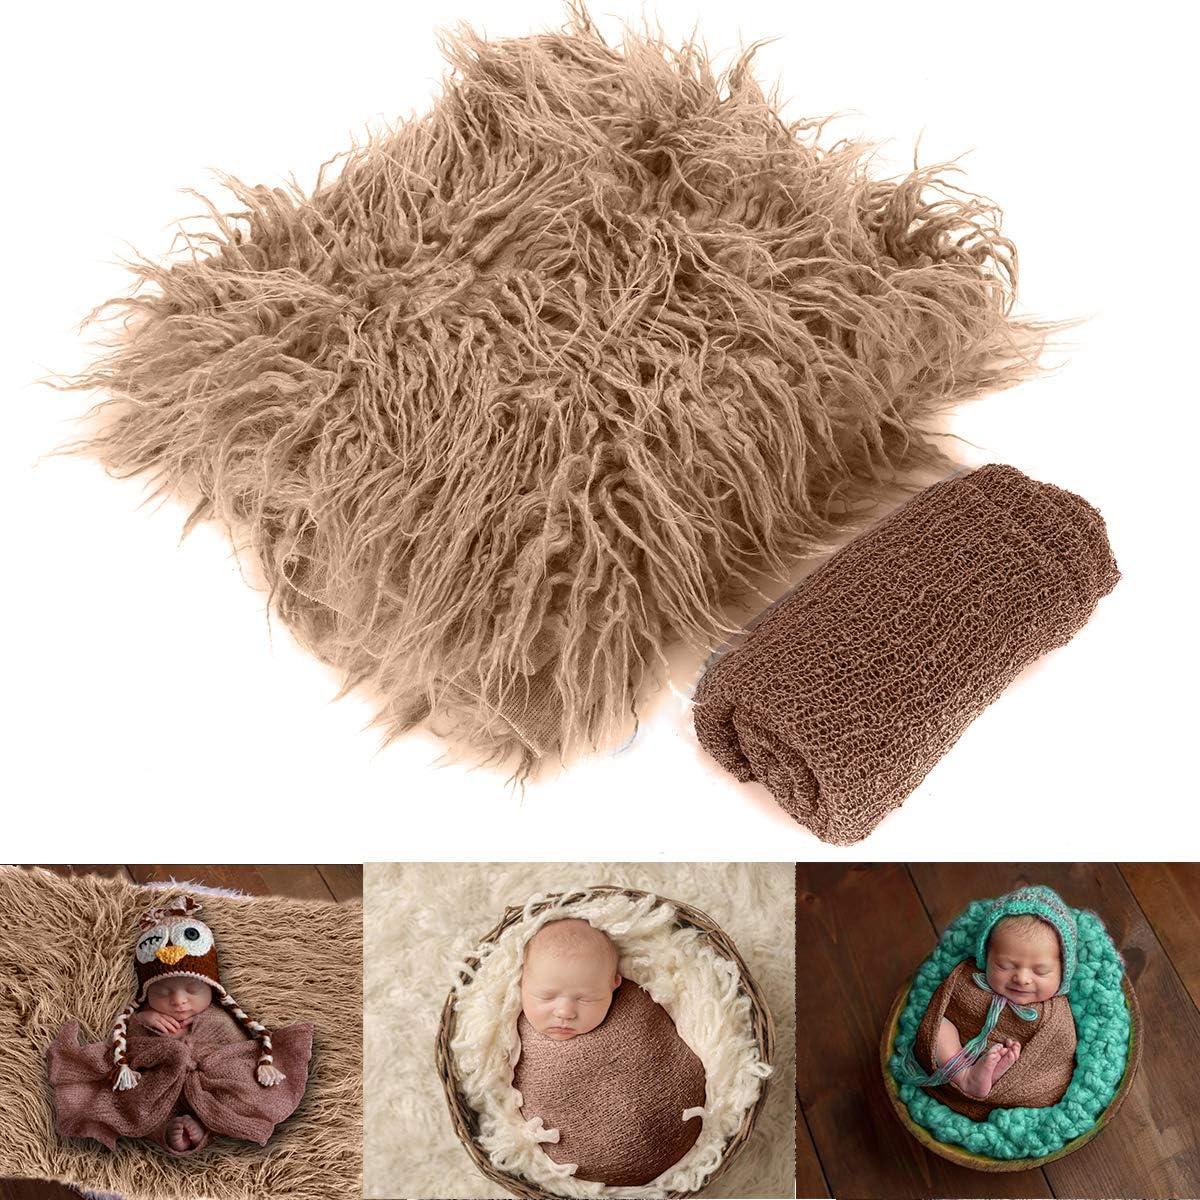 Yinuoday 2 Piezas de Accesorios de fotografía para bebés recién Nacidos DIY envolturas para recién Nacidos Manta de fotografía para bebés y niñas